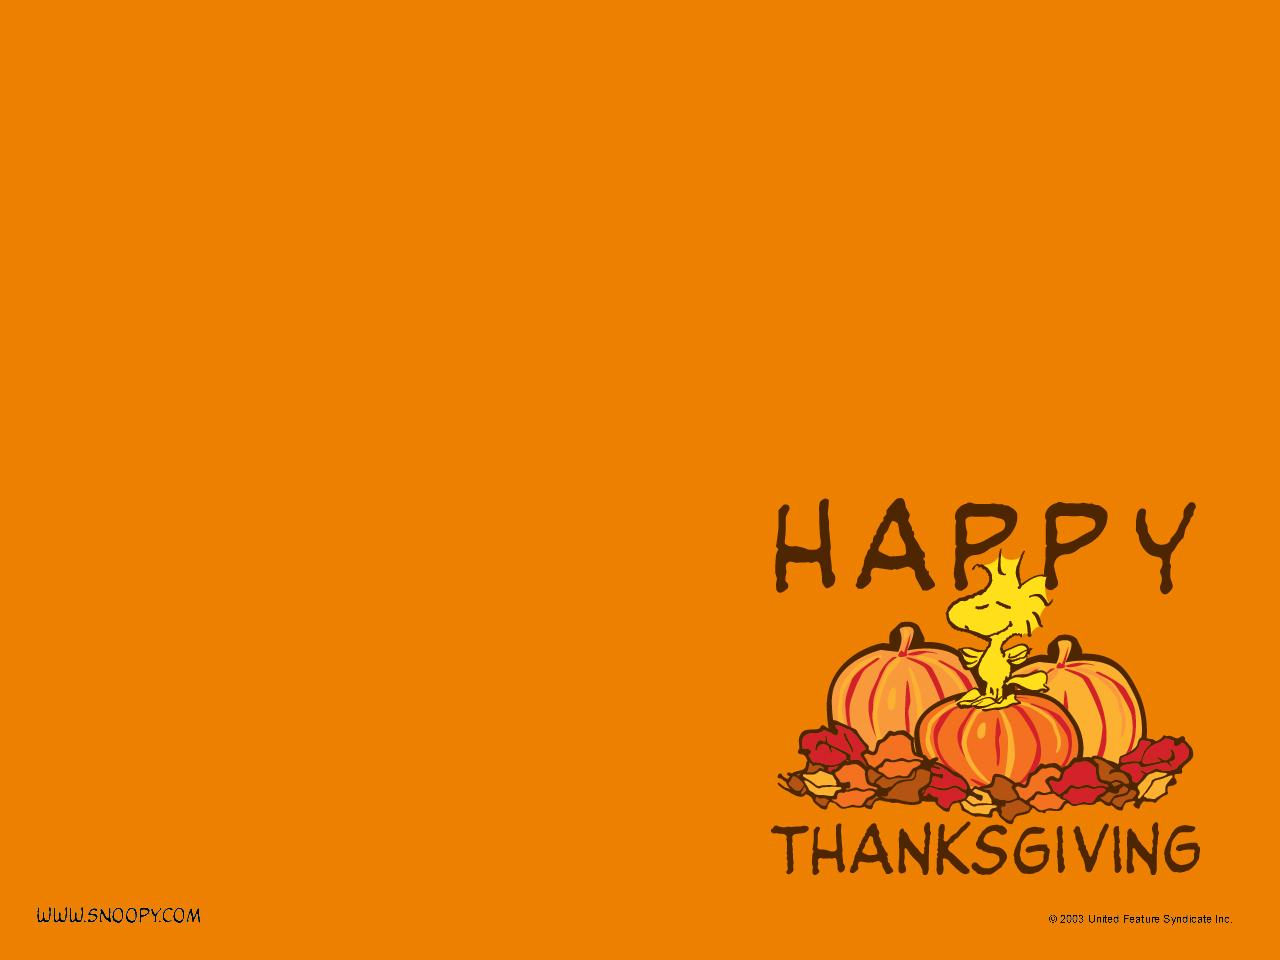 Peanuts images Thanksgiving wallpaper photos 452774 1280x960